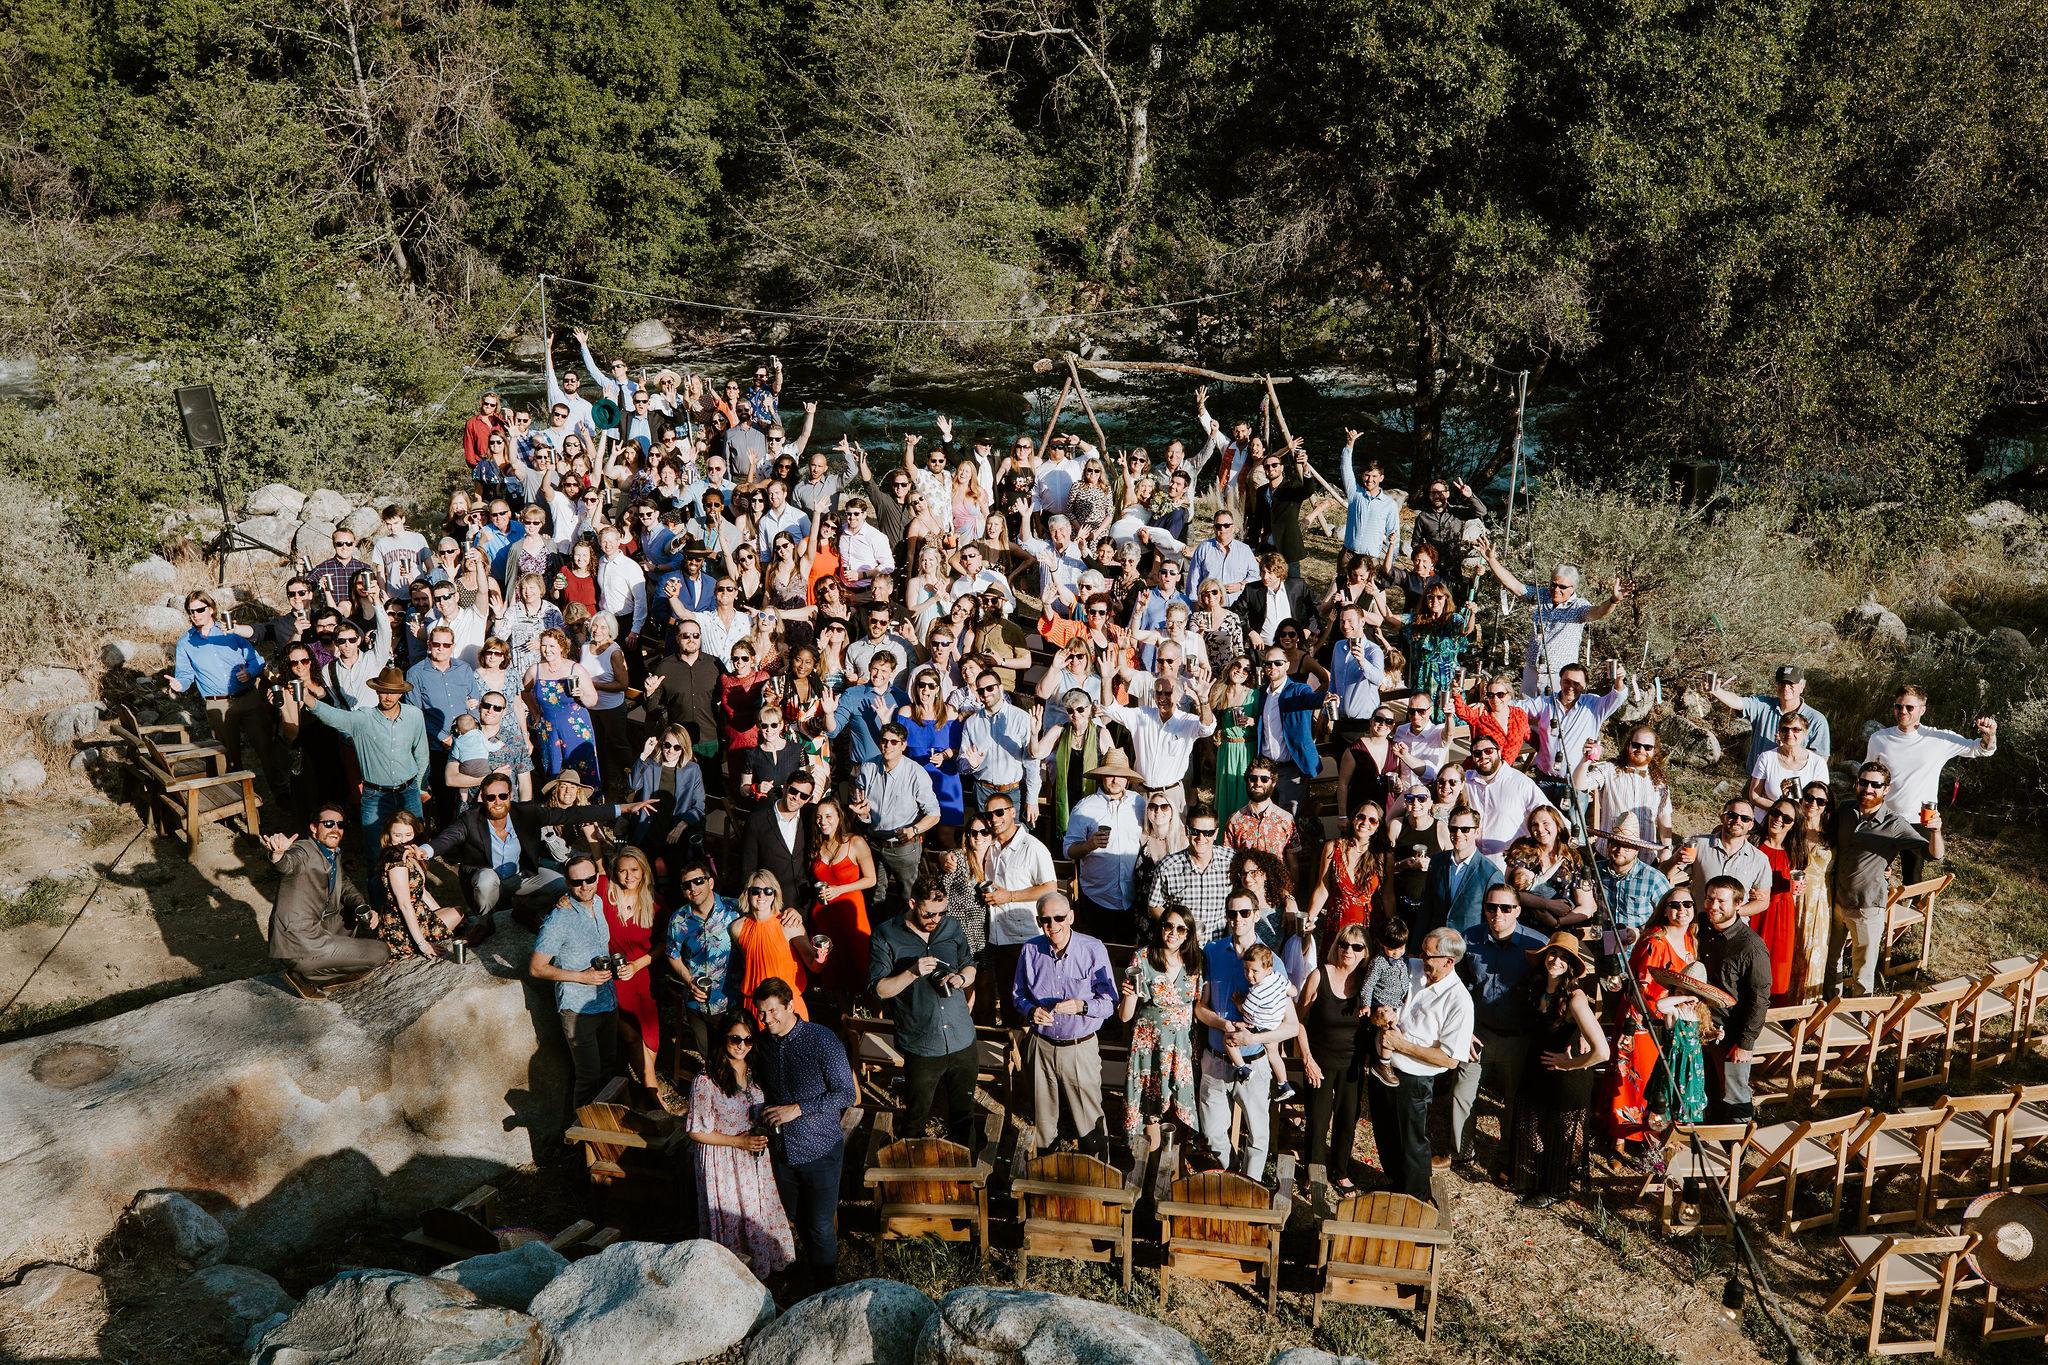 RedwoodRanch_Geoff&LyndsiPhotography_Mike&Amanda_Ceremony115.jpg